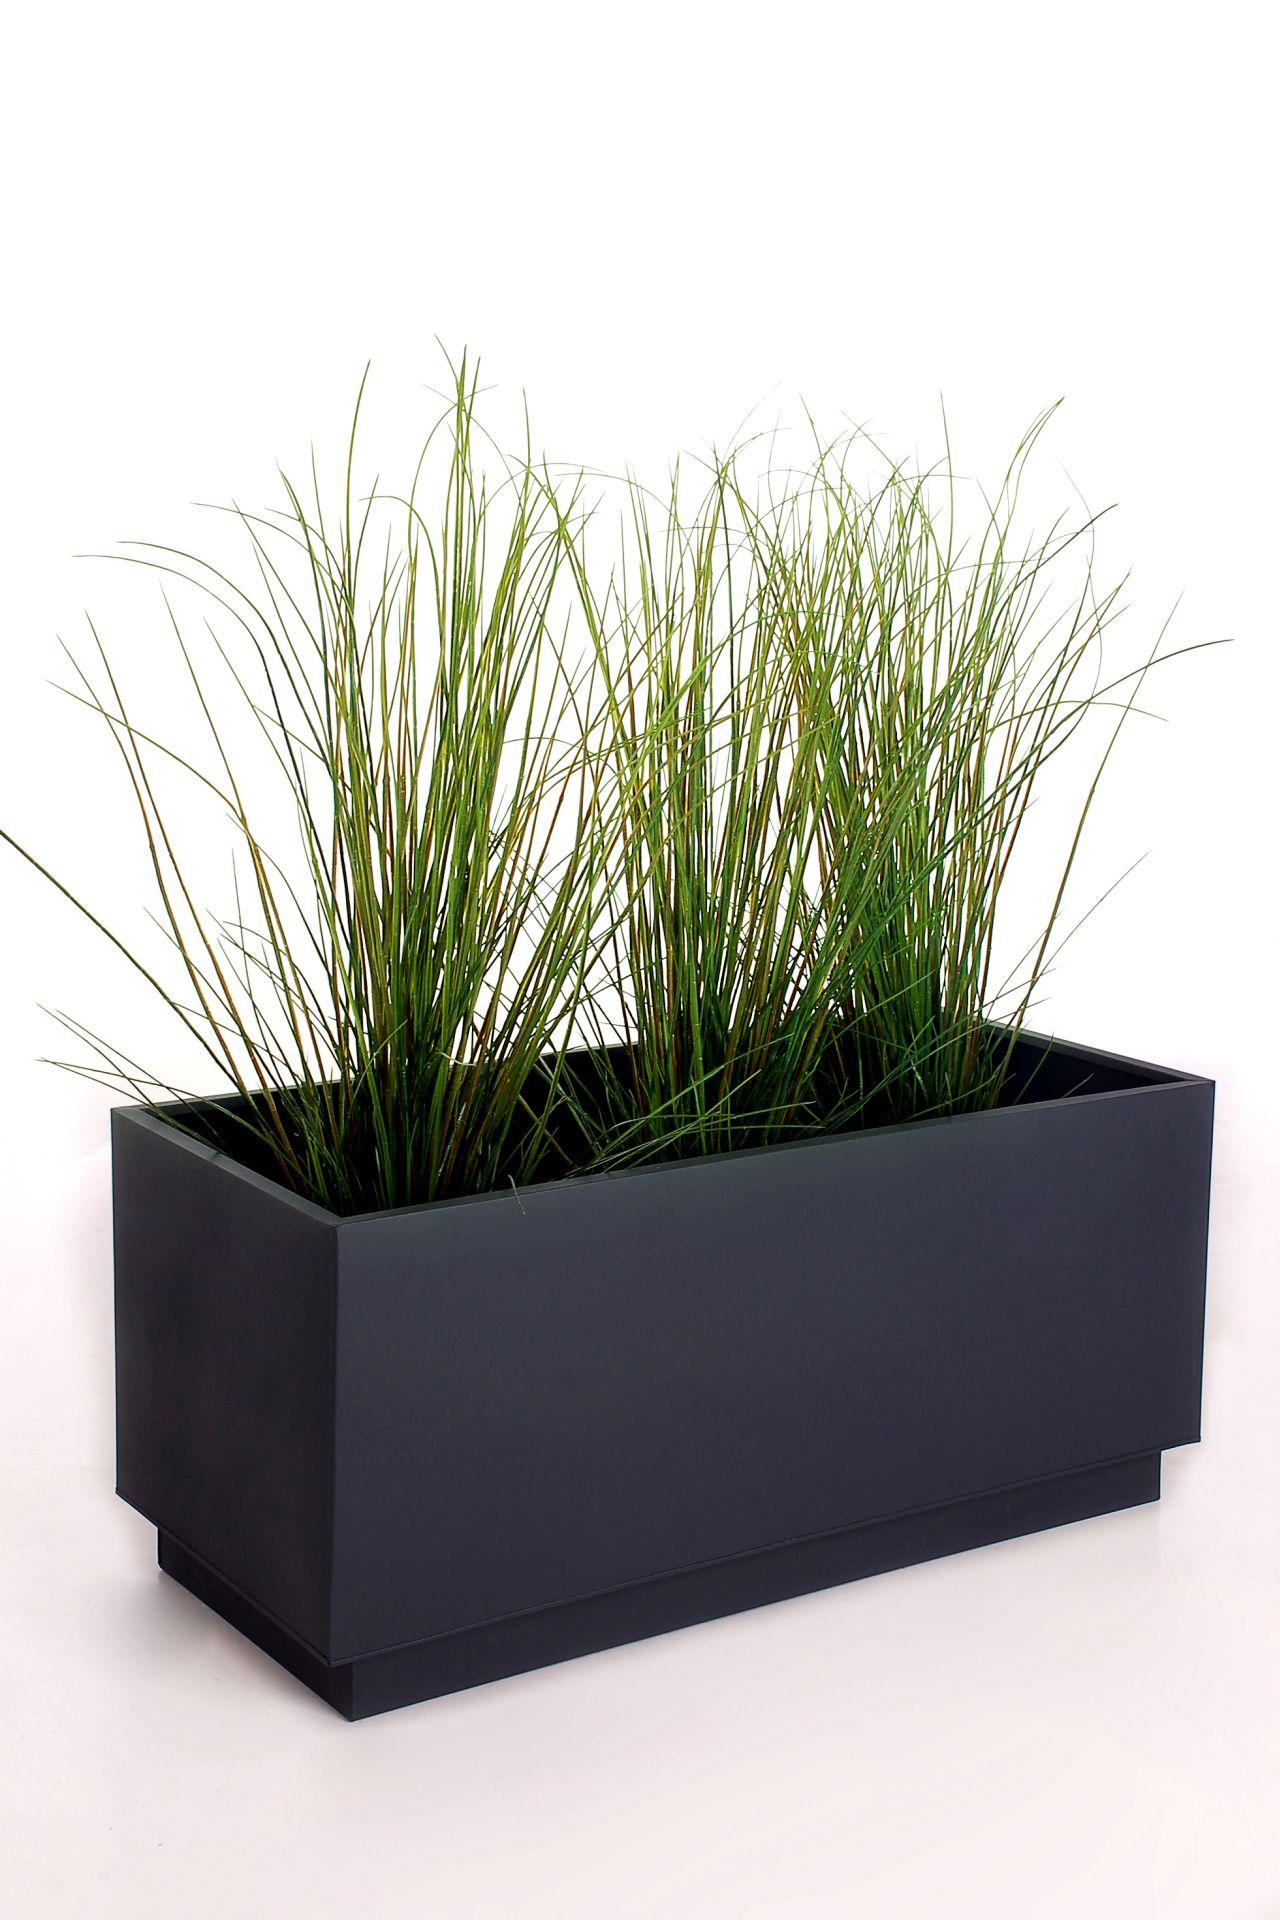 blumenk bel pflanzk bel pflanzgef e aus fiberglas block anthrazit 60x60x60cm ebay. Black Bedroom Furniture Sets. Home Design Ideas